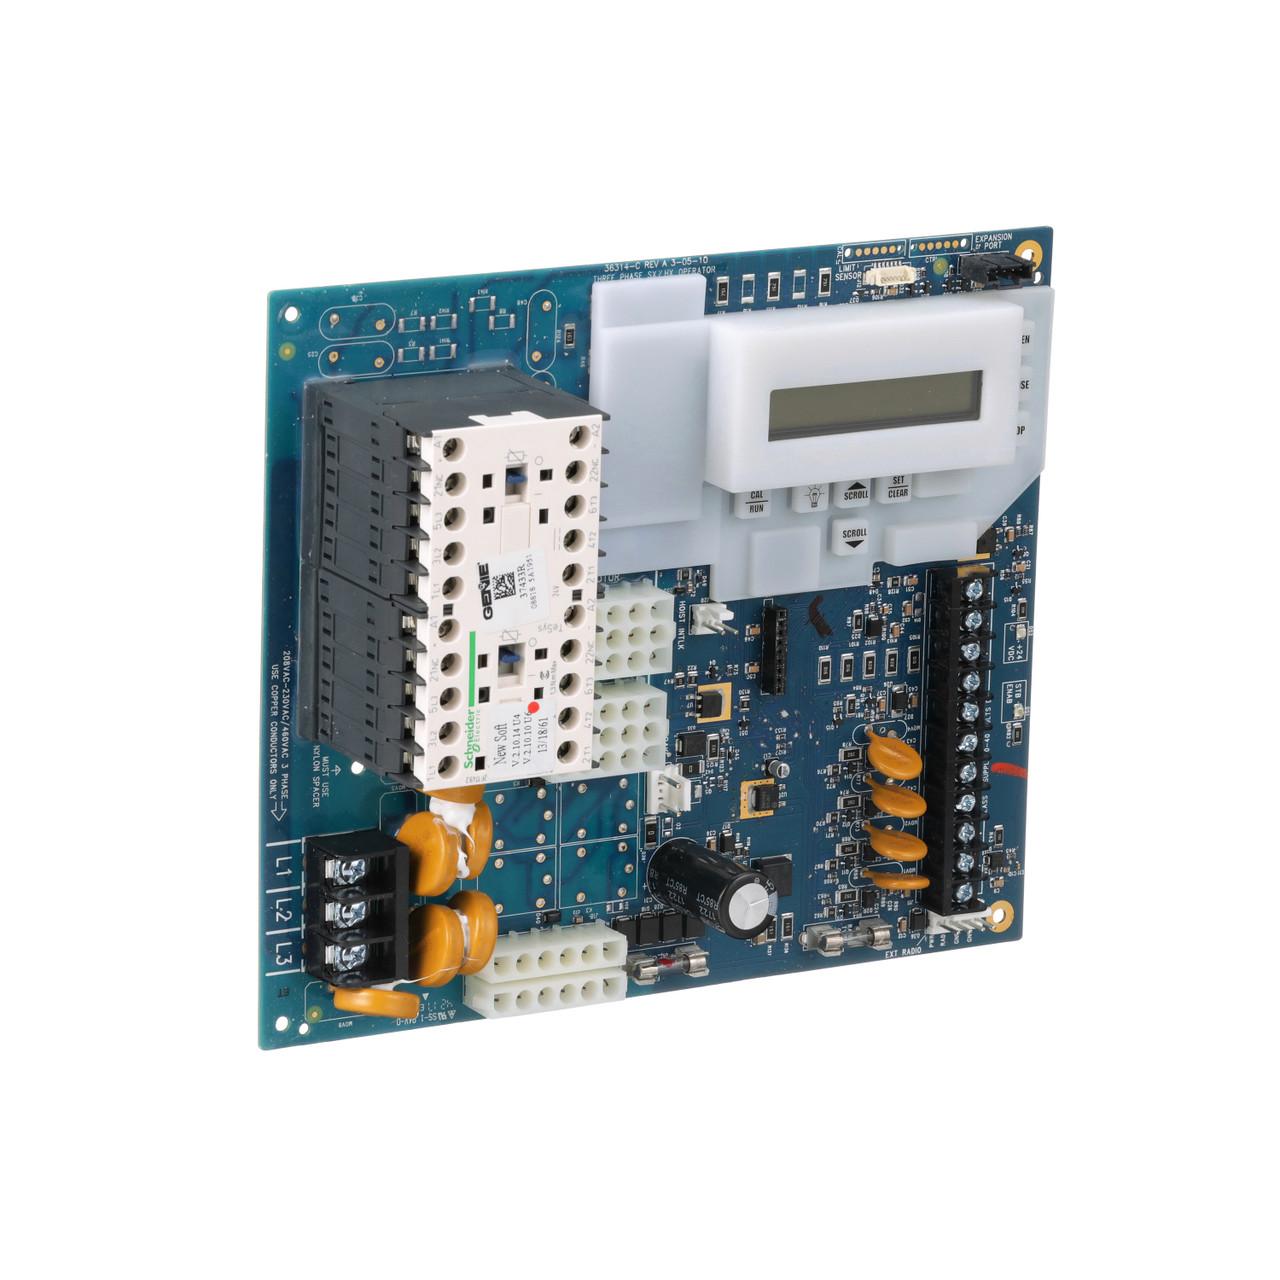 Circuit Board Rsx Amp Rhx 3 Phase 3 4hp Overhead Door Parts Online